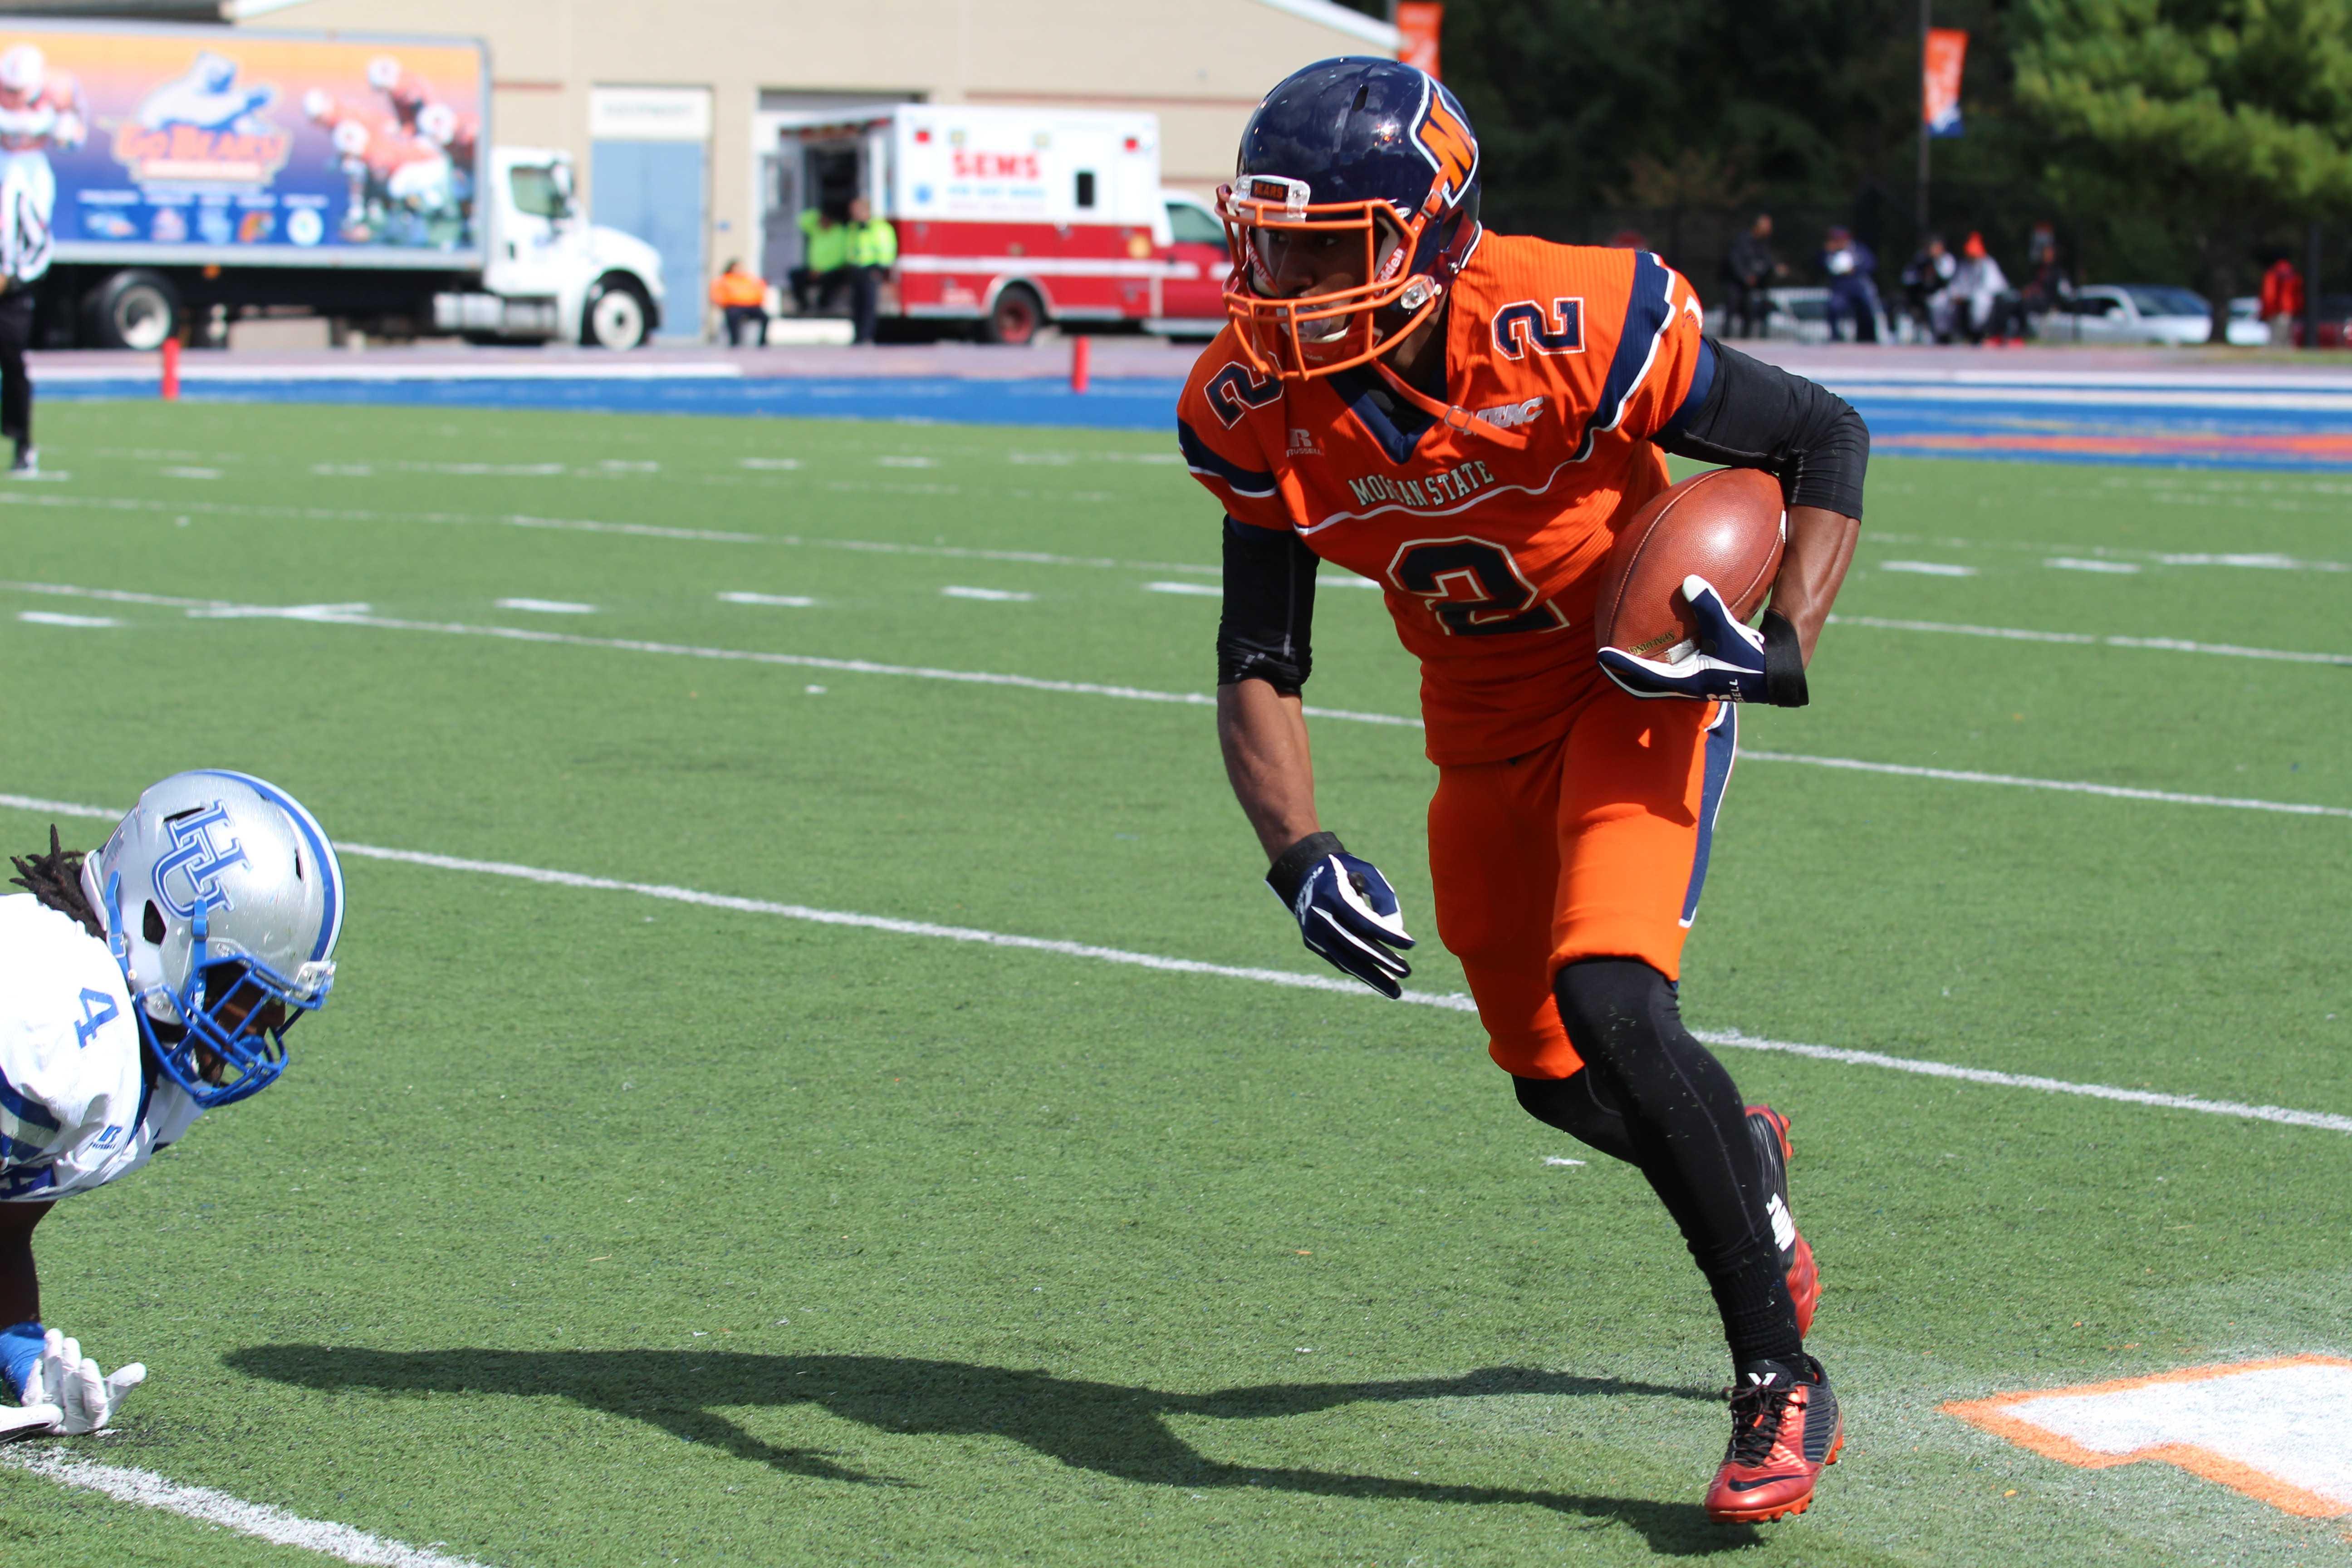 Junior receiver Ricky Fisk running the ball during the Bears' 20-10 loss to Hampton. Photo by Benjamin McKnight III